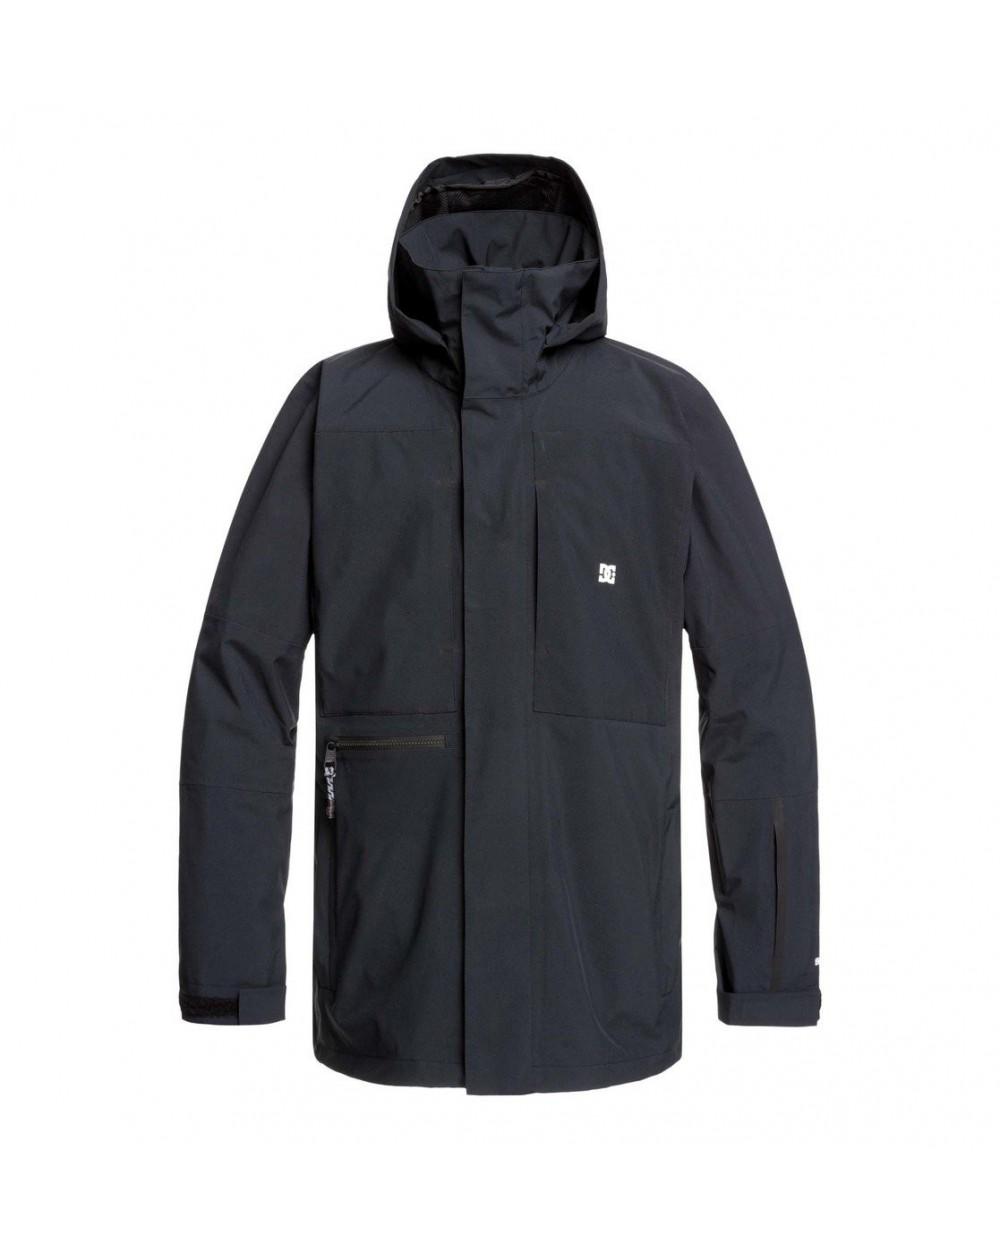 Dc Command Snow Jacket - Black